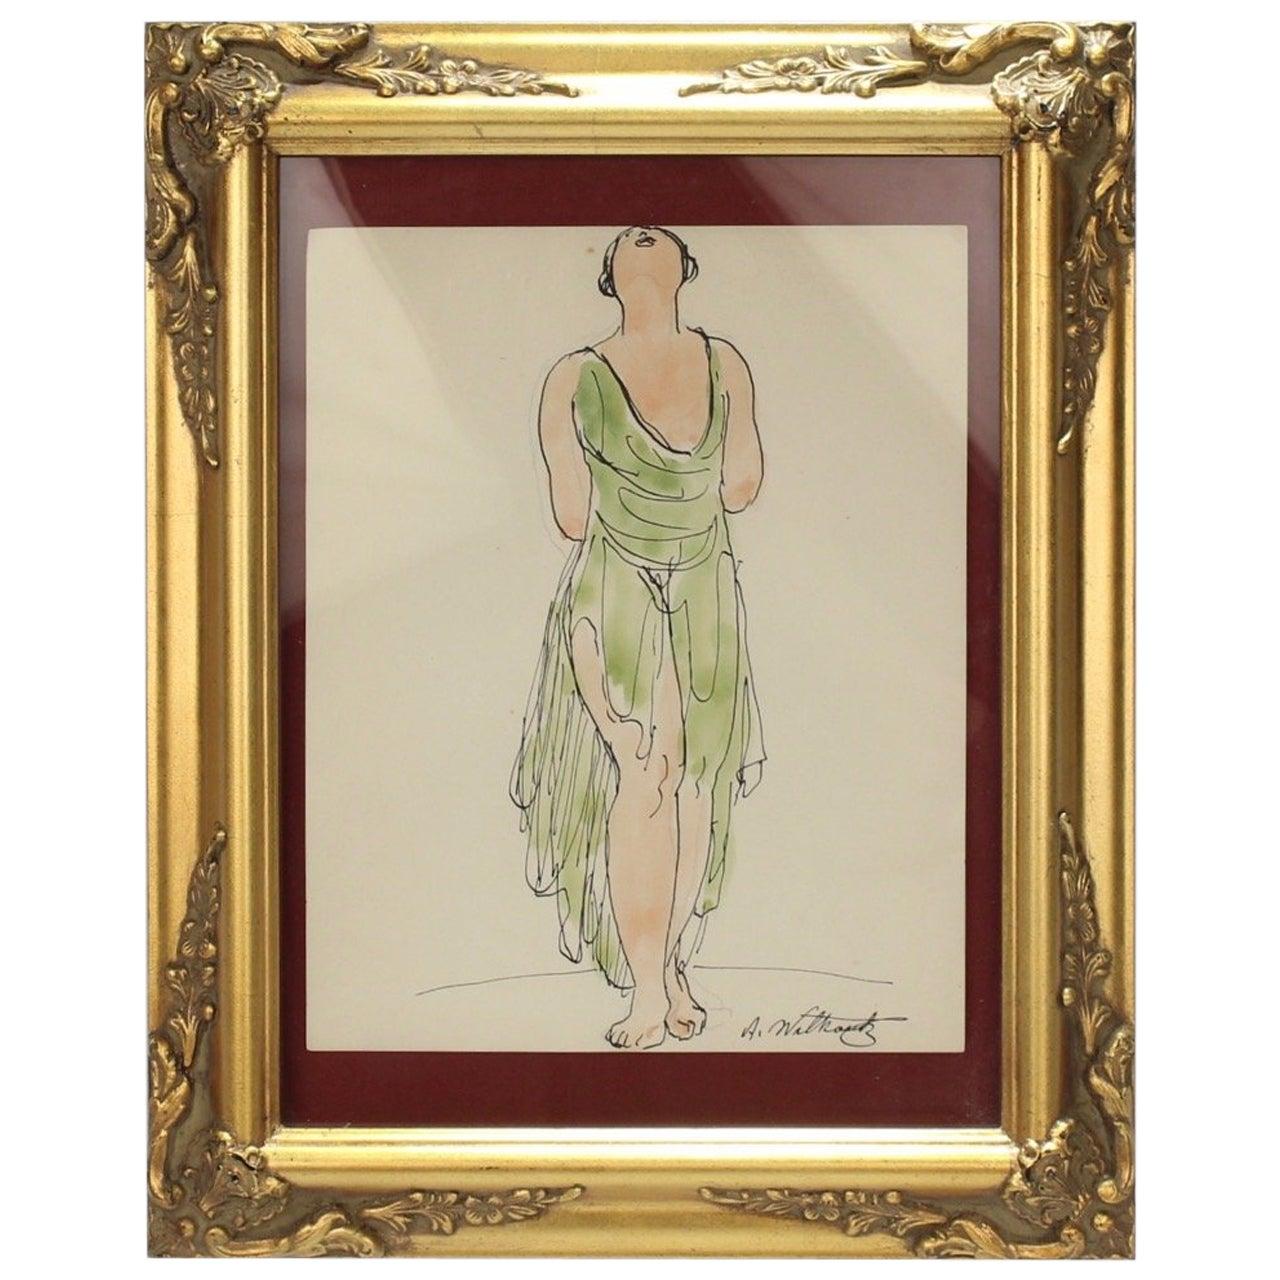 Abraham Walkowitz Ink Drawing of Ballet Dancer Isadora Duncan in Green